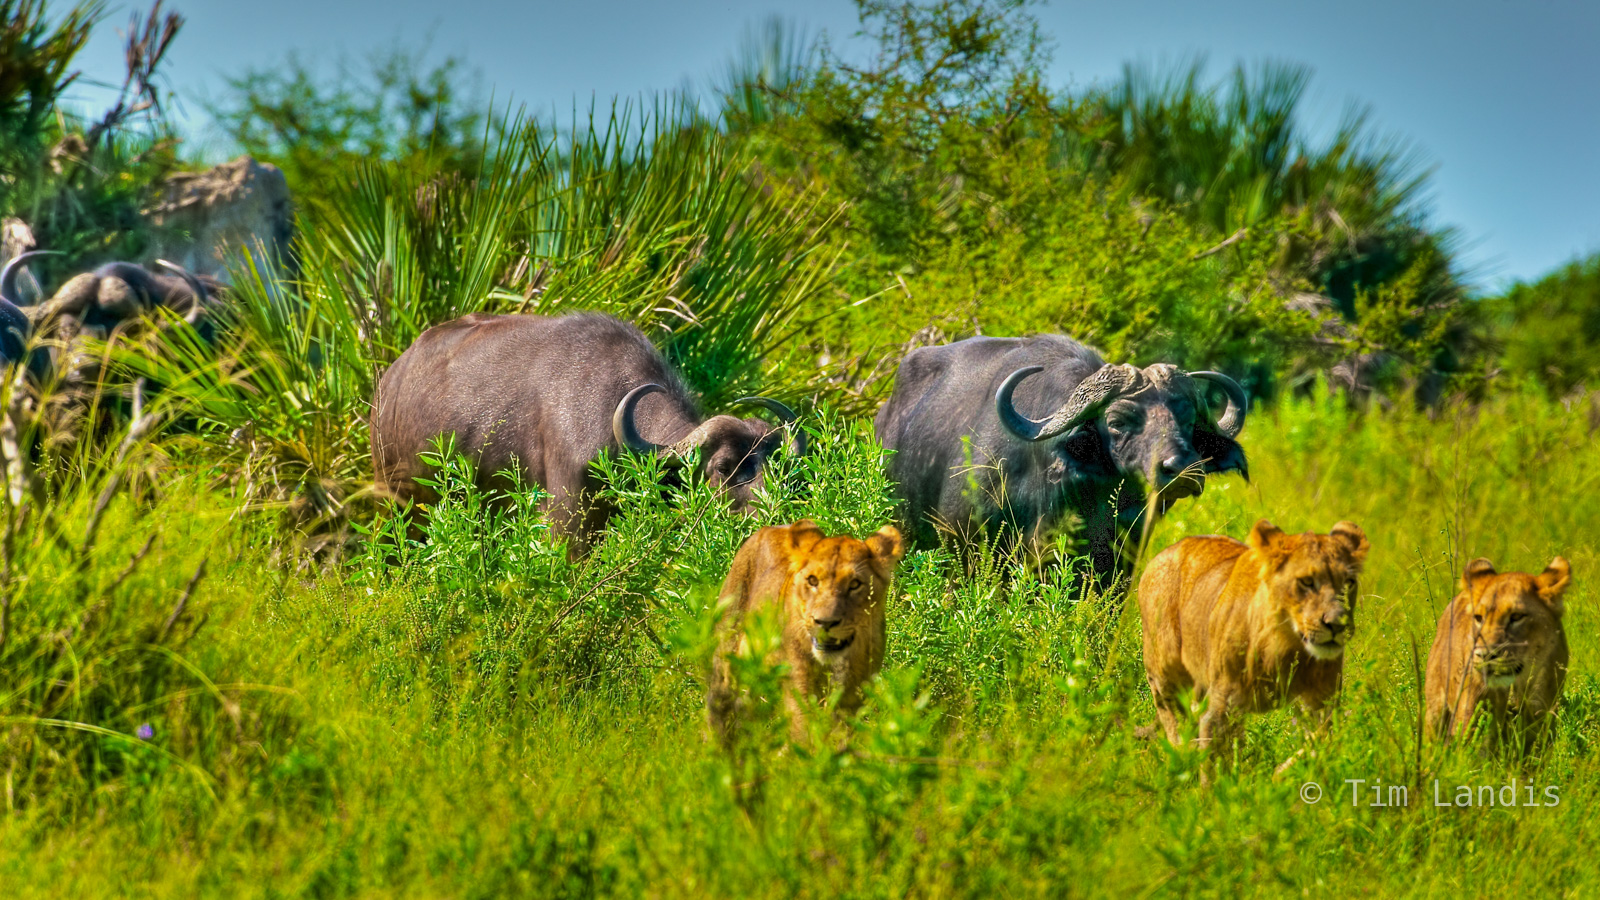 Botswanna, big buffalo push, buffalo, buffalo wars, cape buffalo, cast out of eden, driving out the lions, egrets, horns, lions, lions retreating, sleeping buffalo, photo